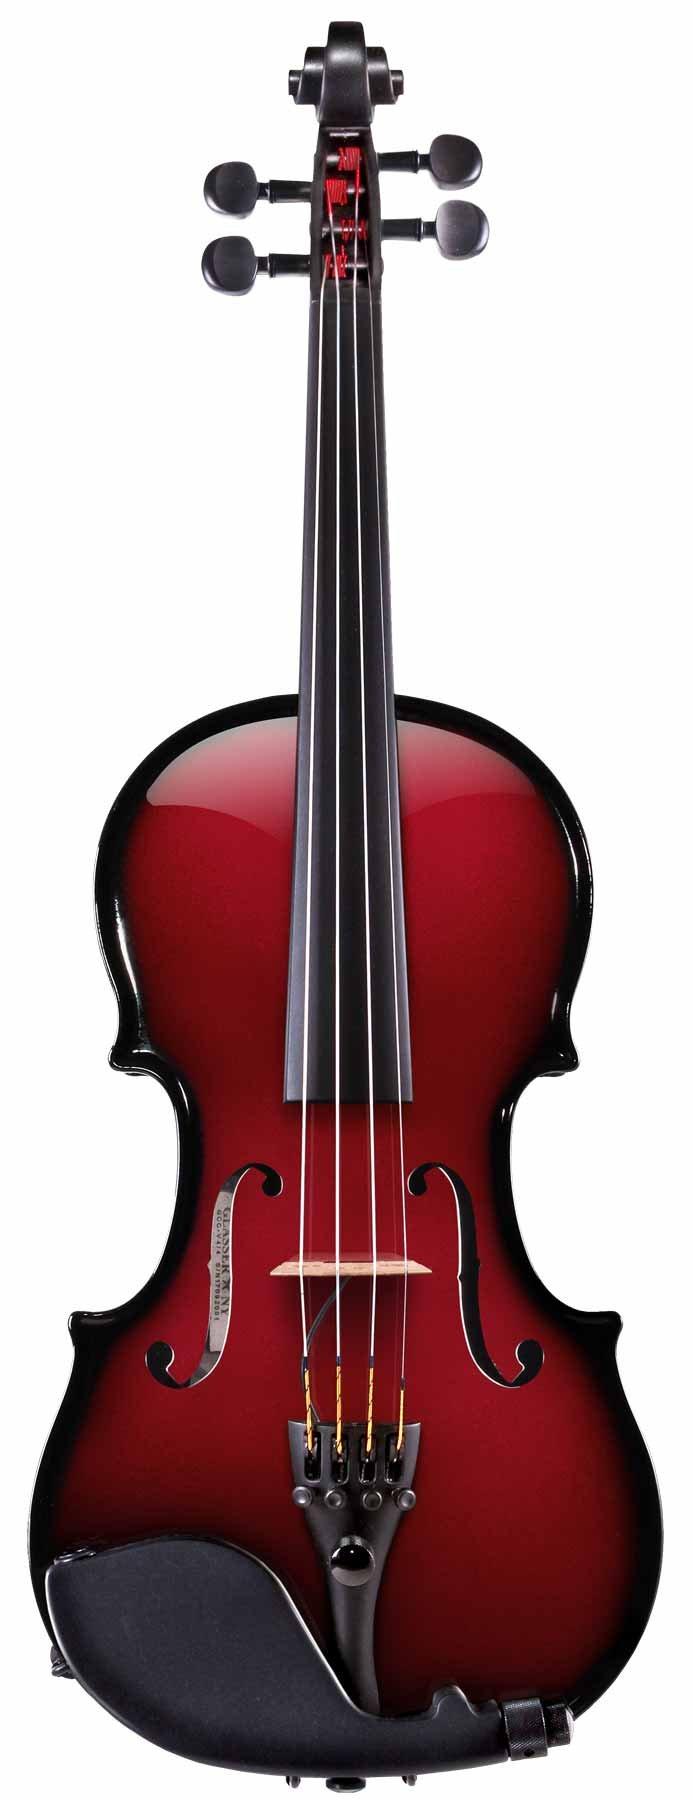 Glasser AEX Carbon Composite Viola (16.5'', Red) by Glasser